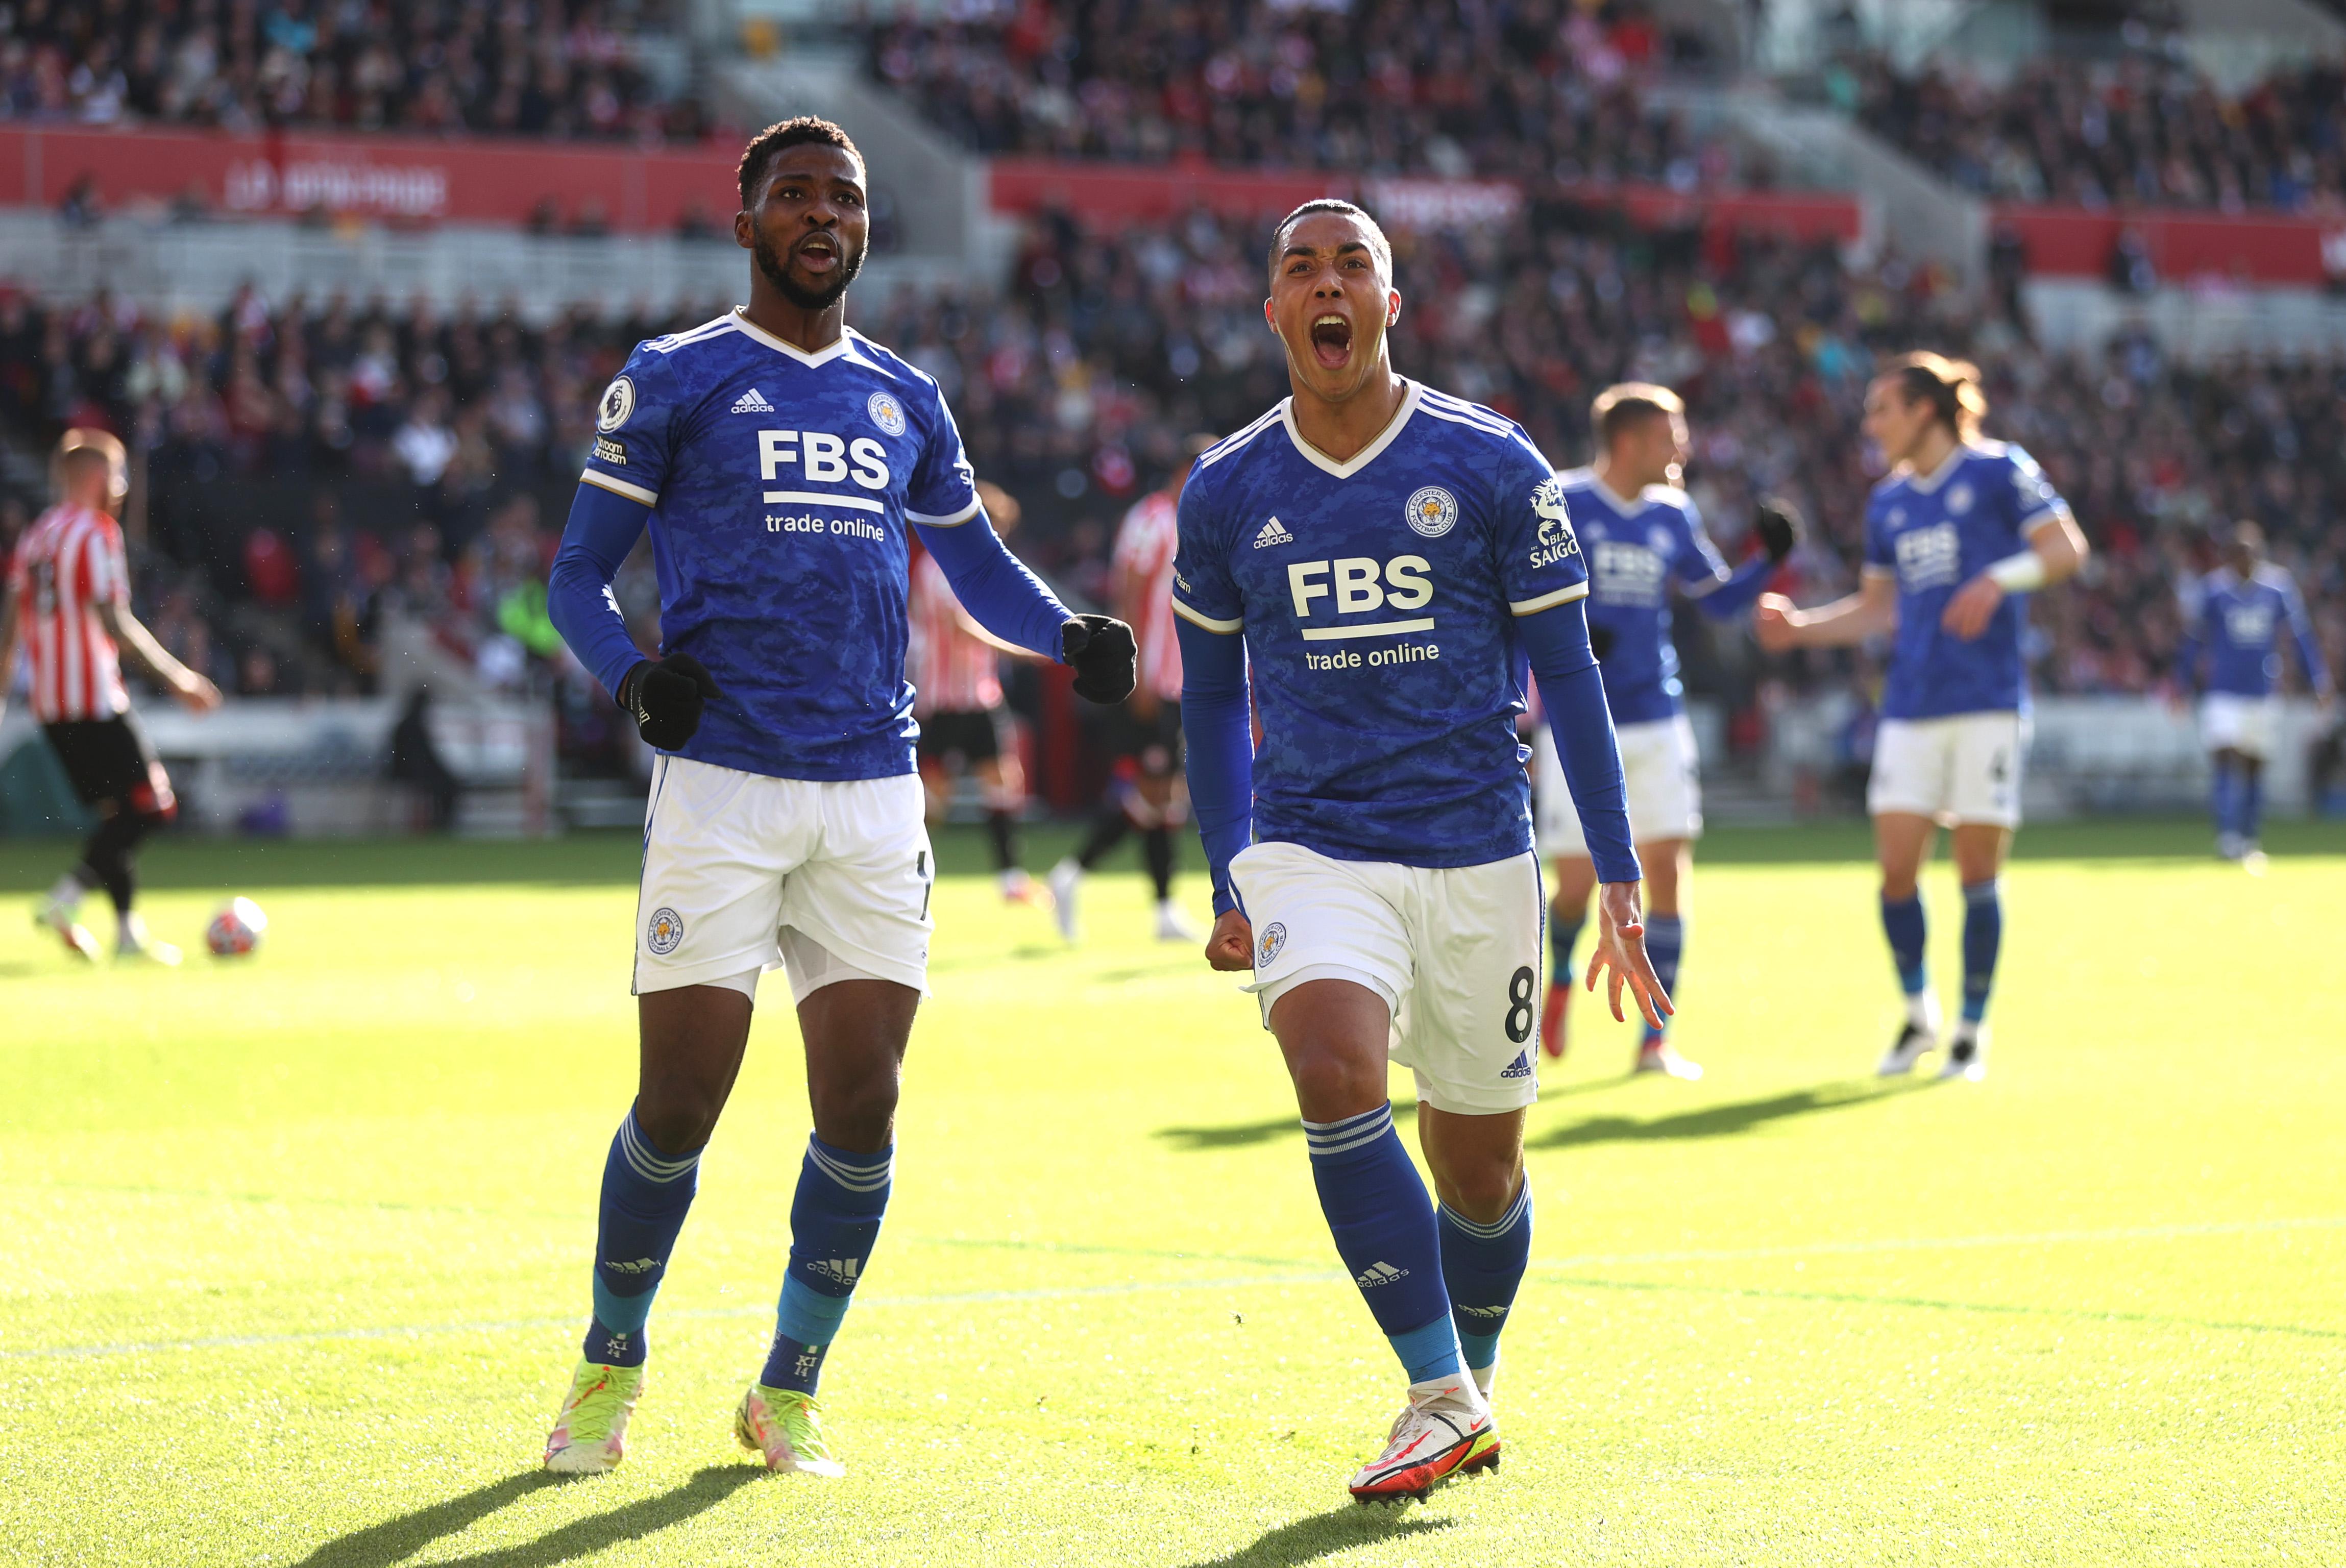 Brentford v Leicester City - Premier League